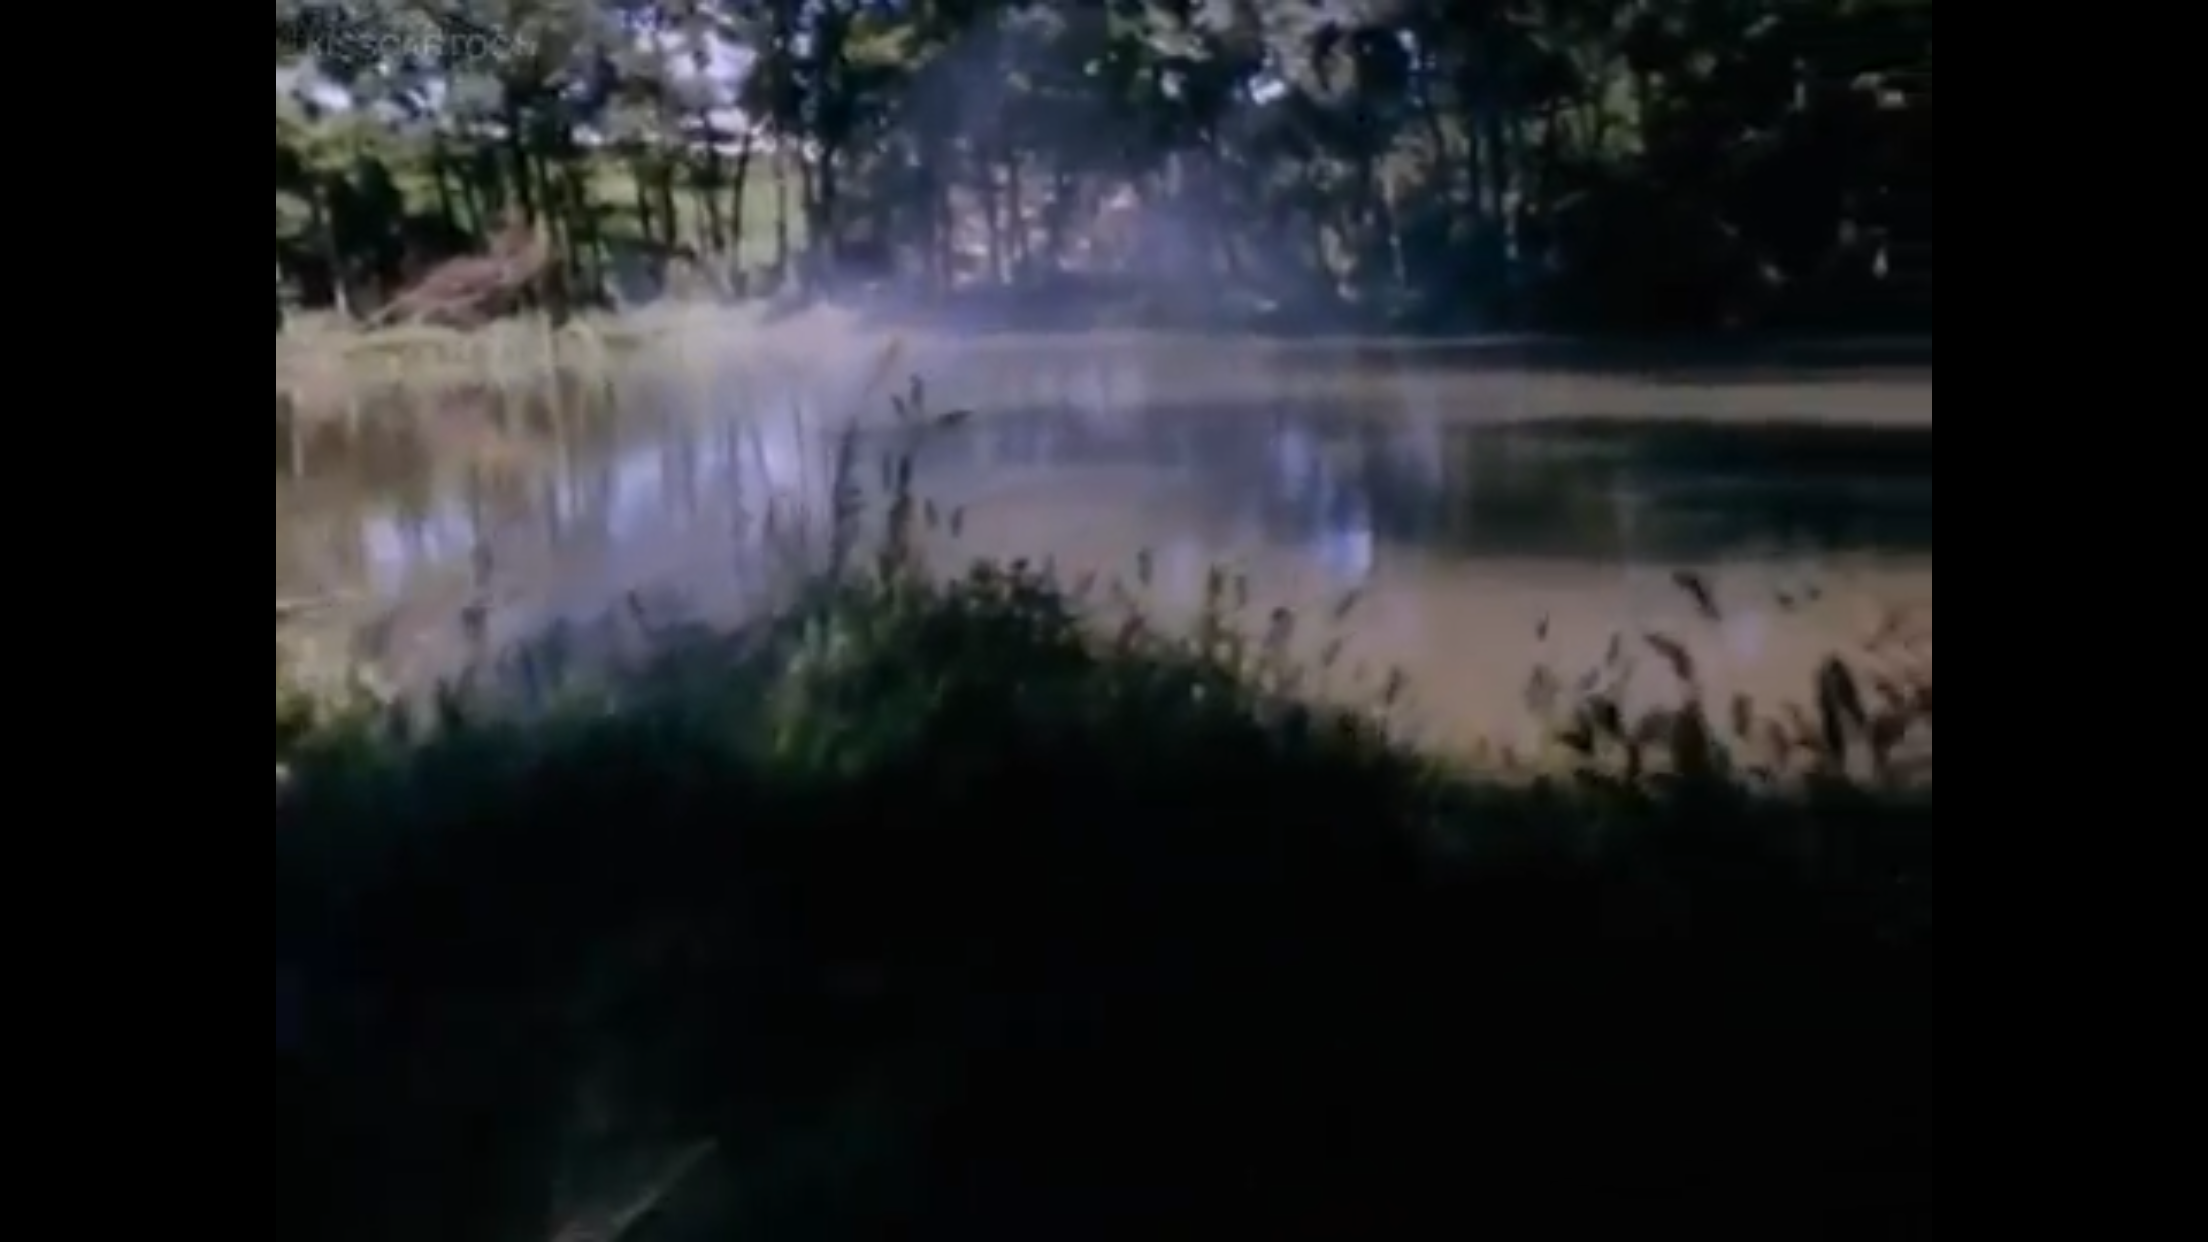 Aquafiend's Lagoon Lair